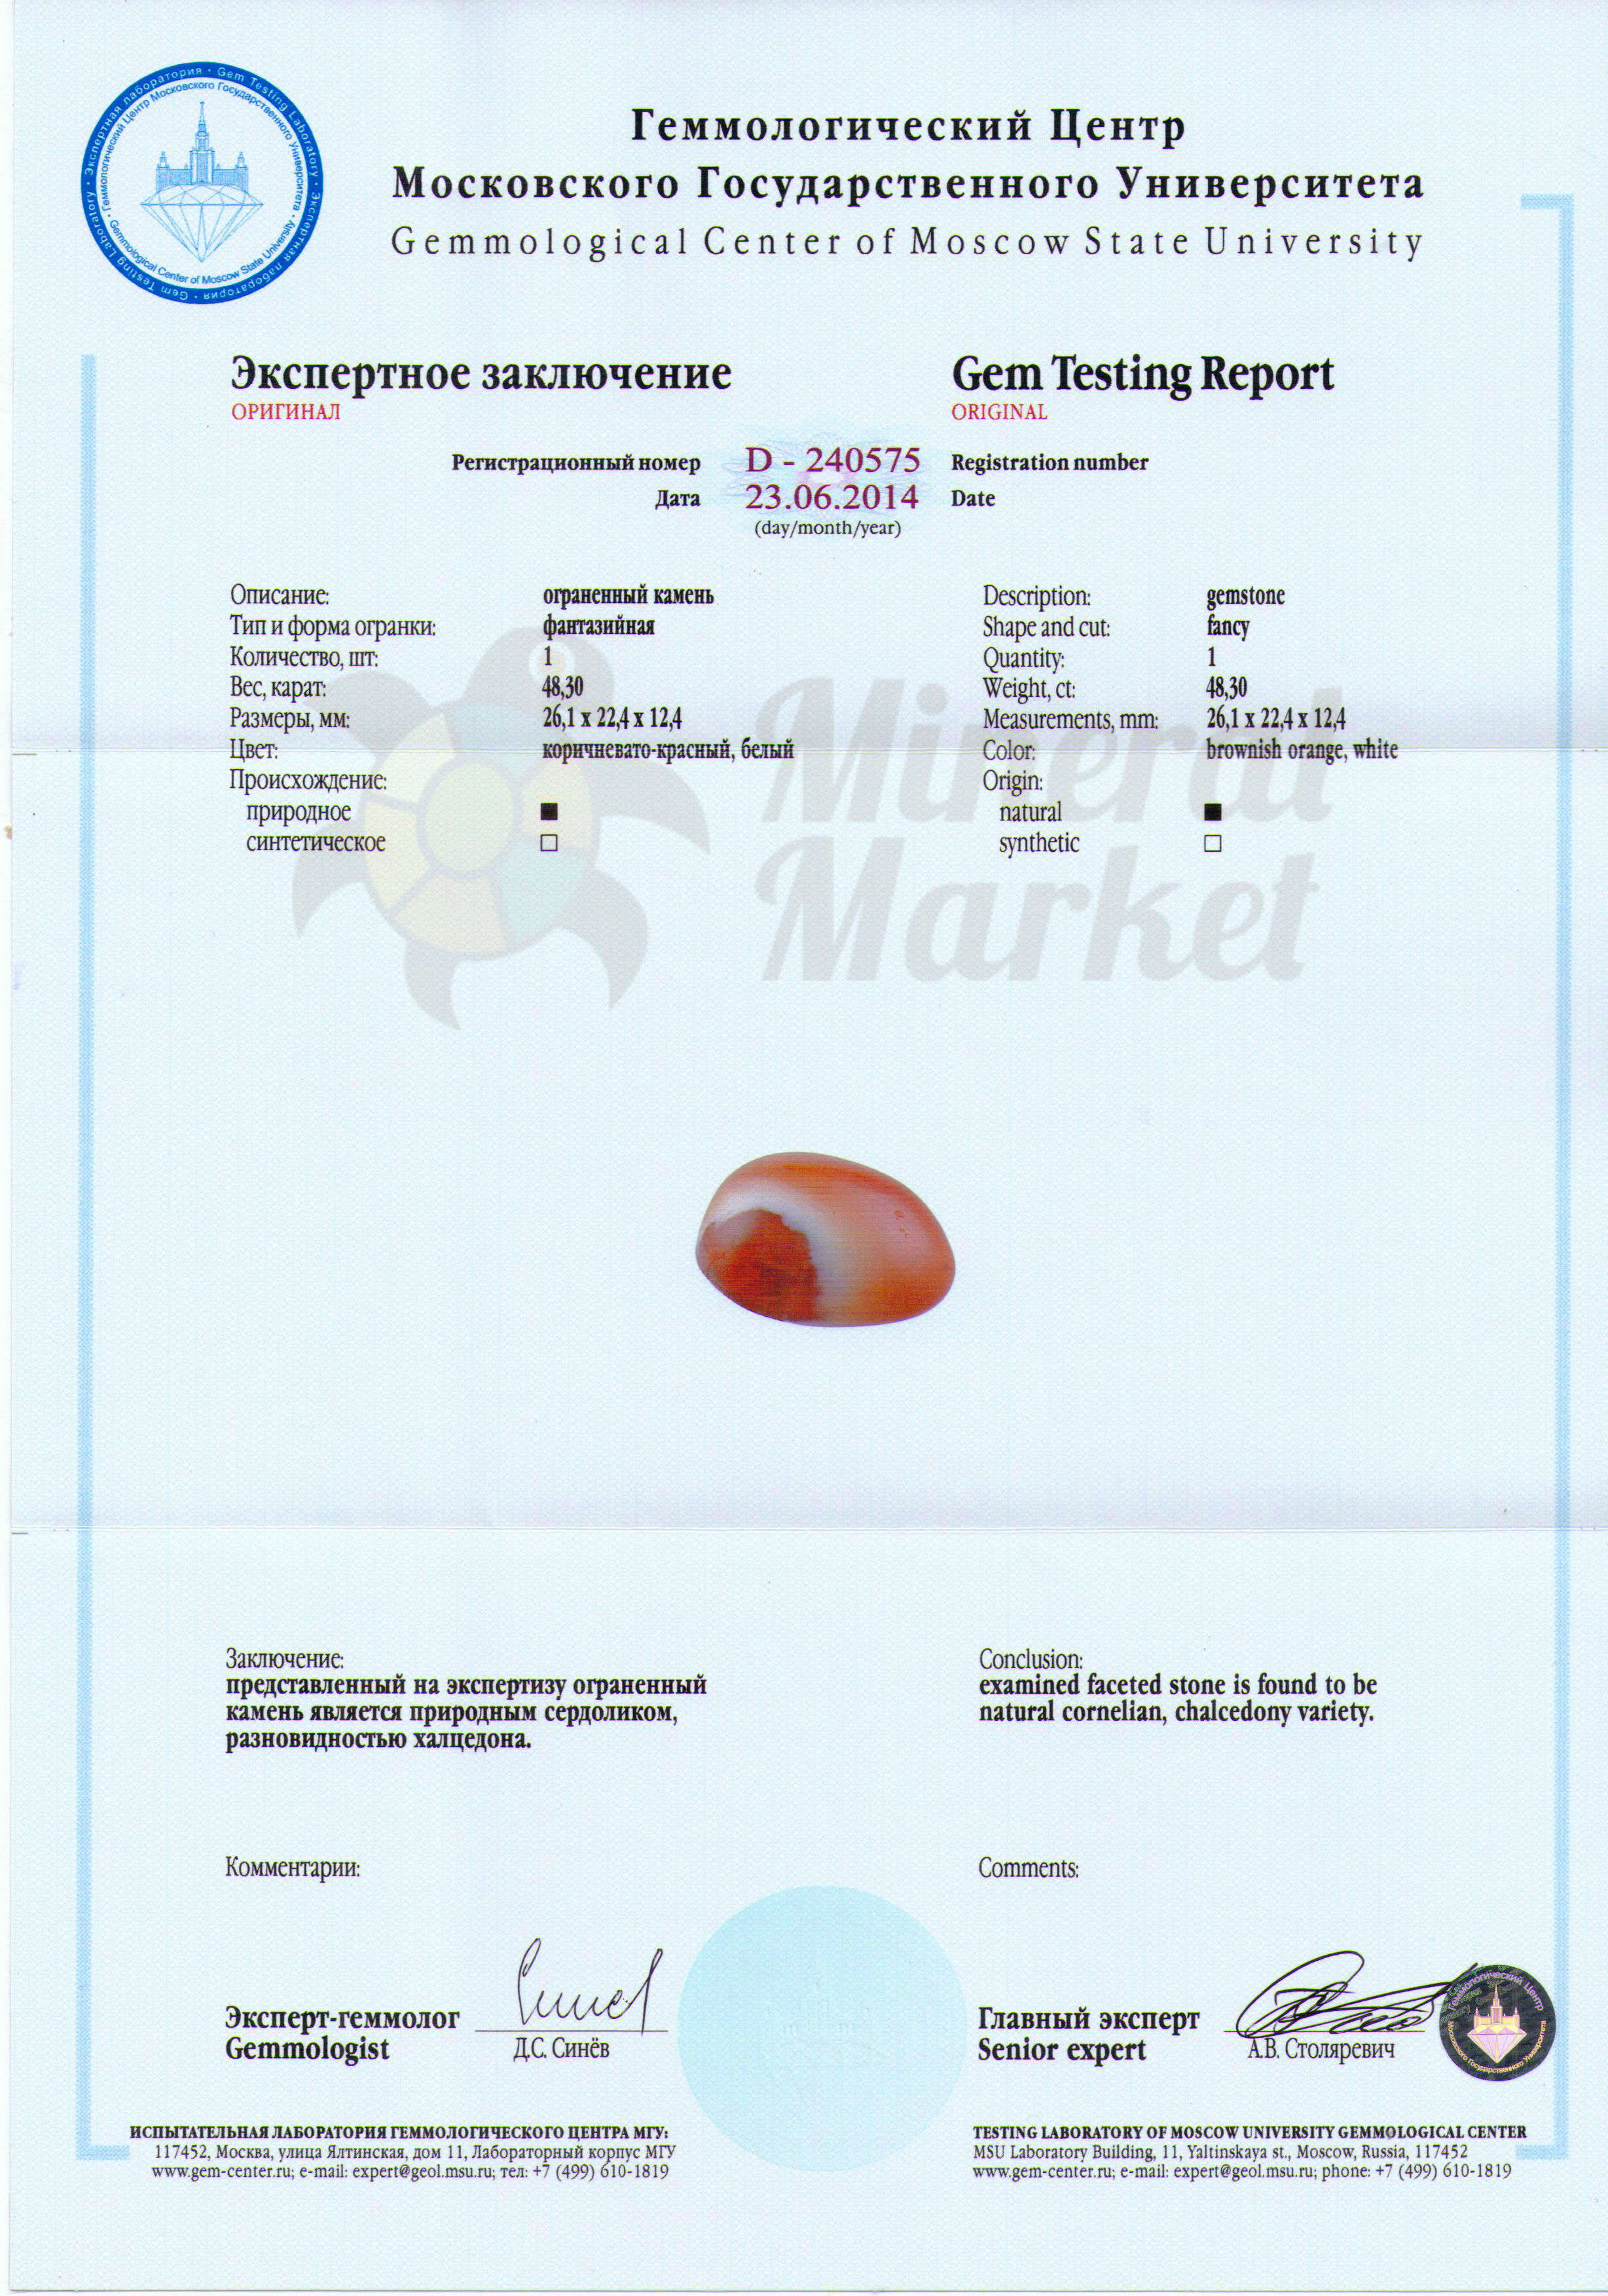 https://mineralmarket.ru/img/certificate/106/106.jpg